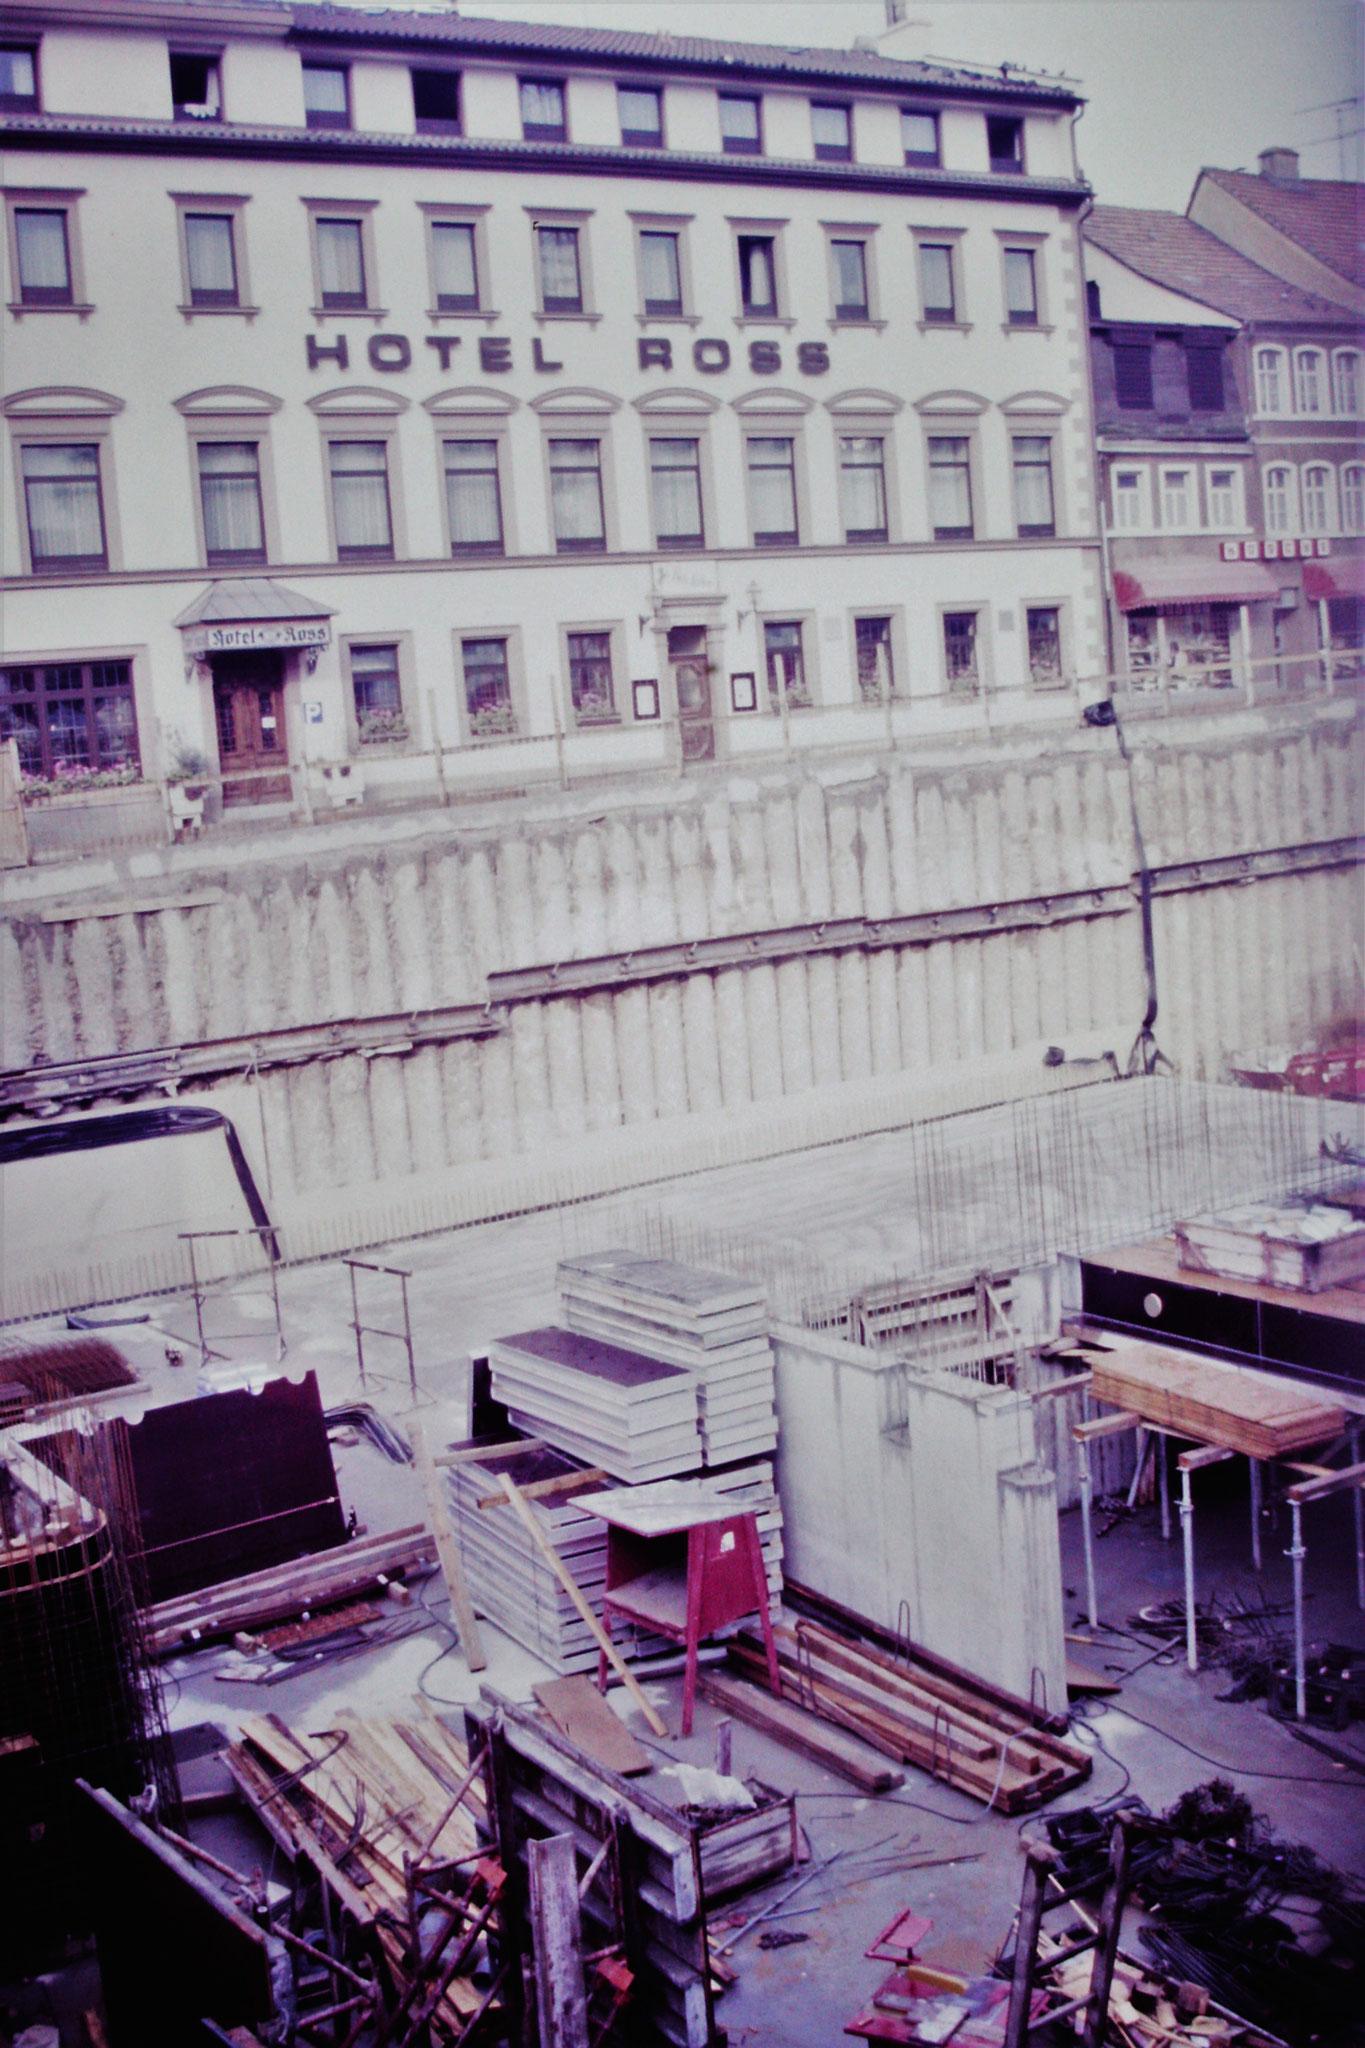 17.8.1986 - Tiefgaragenbau